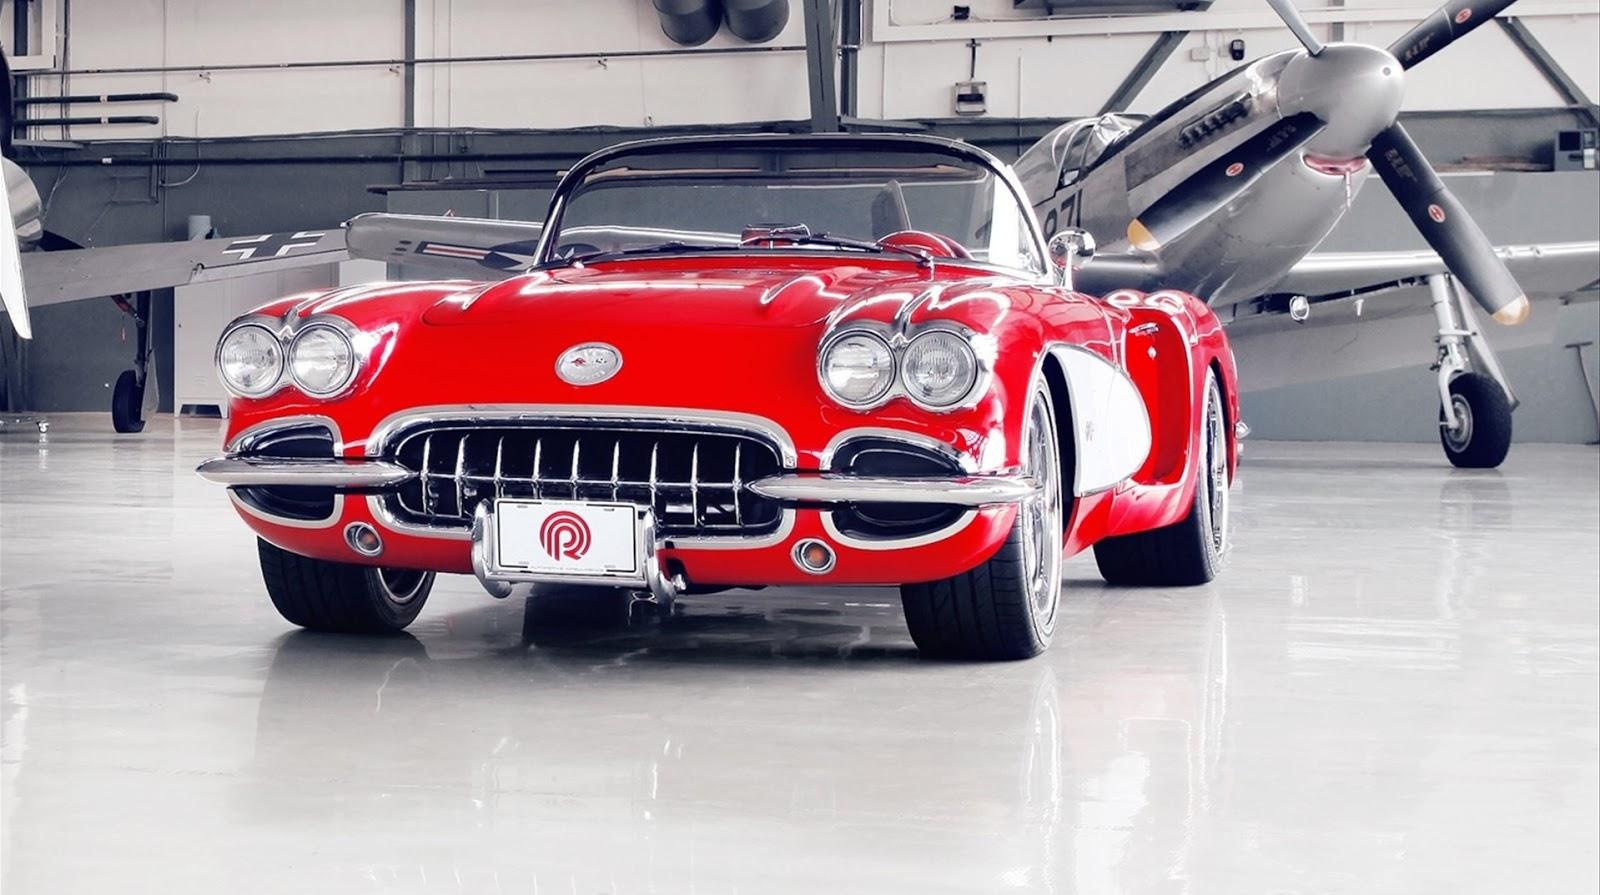 Vintage Corvette 49